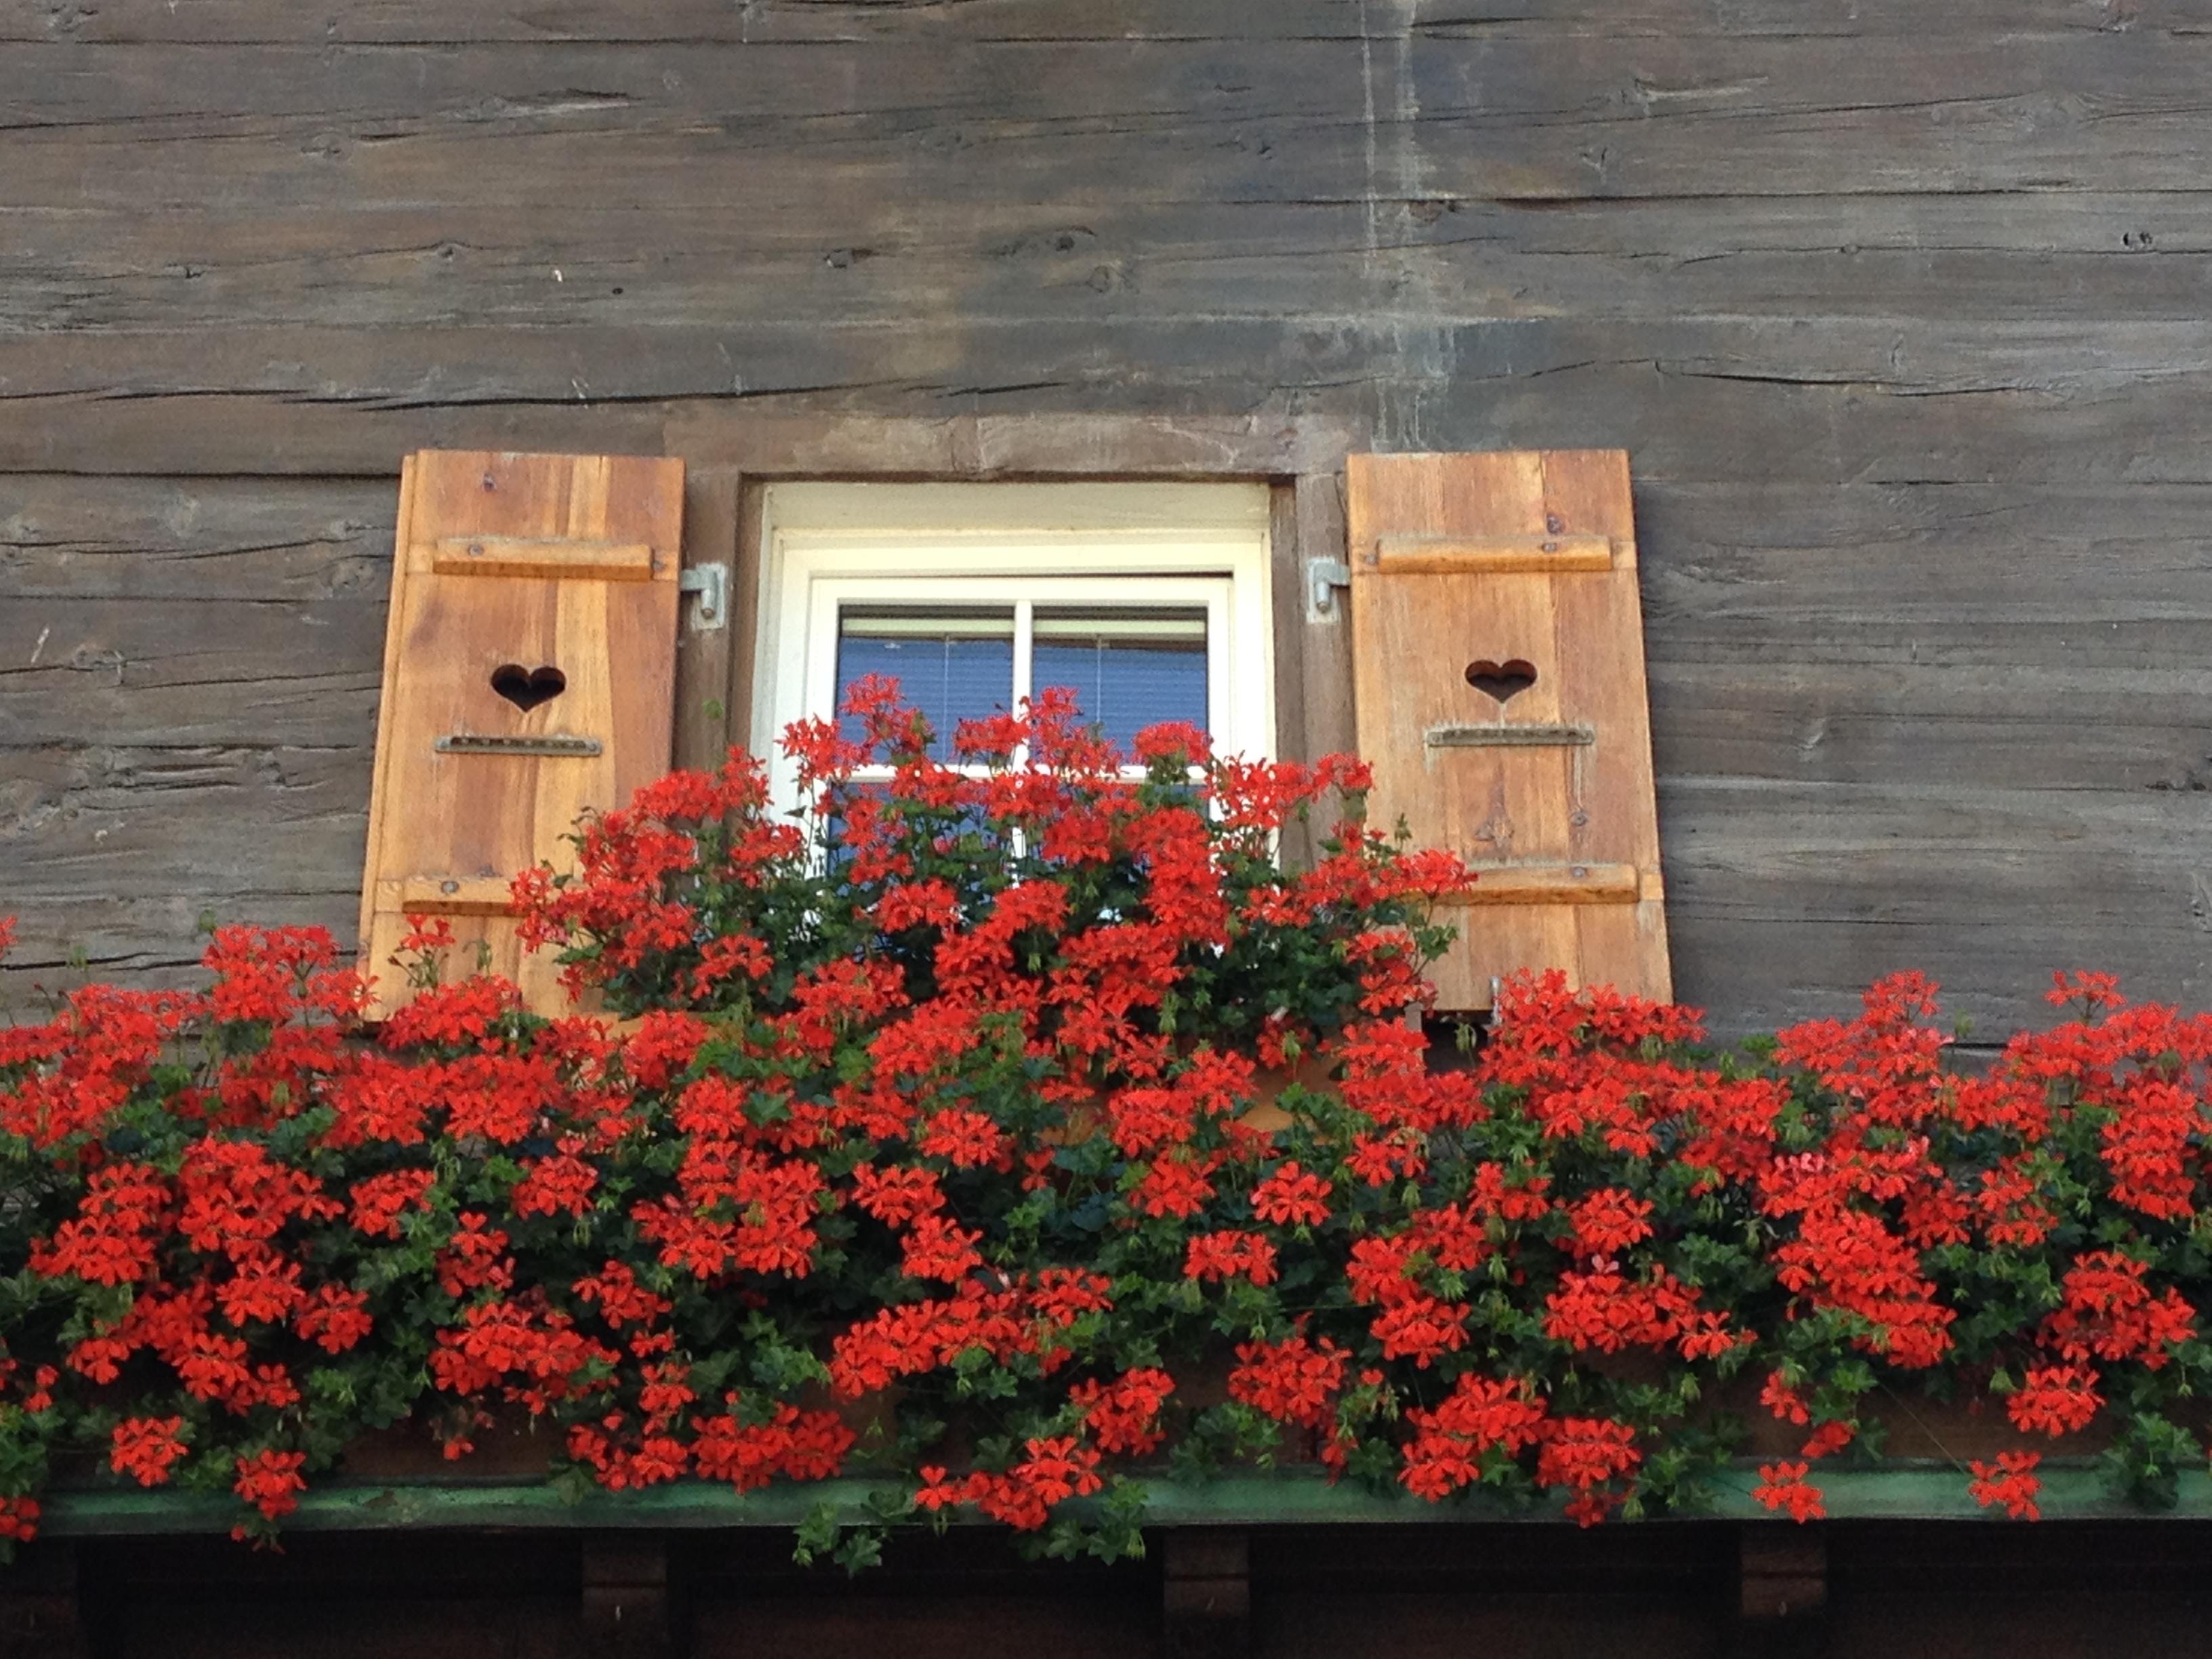 Zermatt @oltreilbalcone